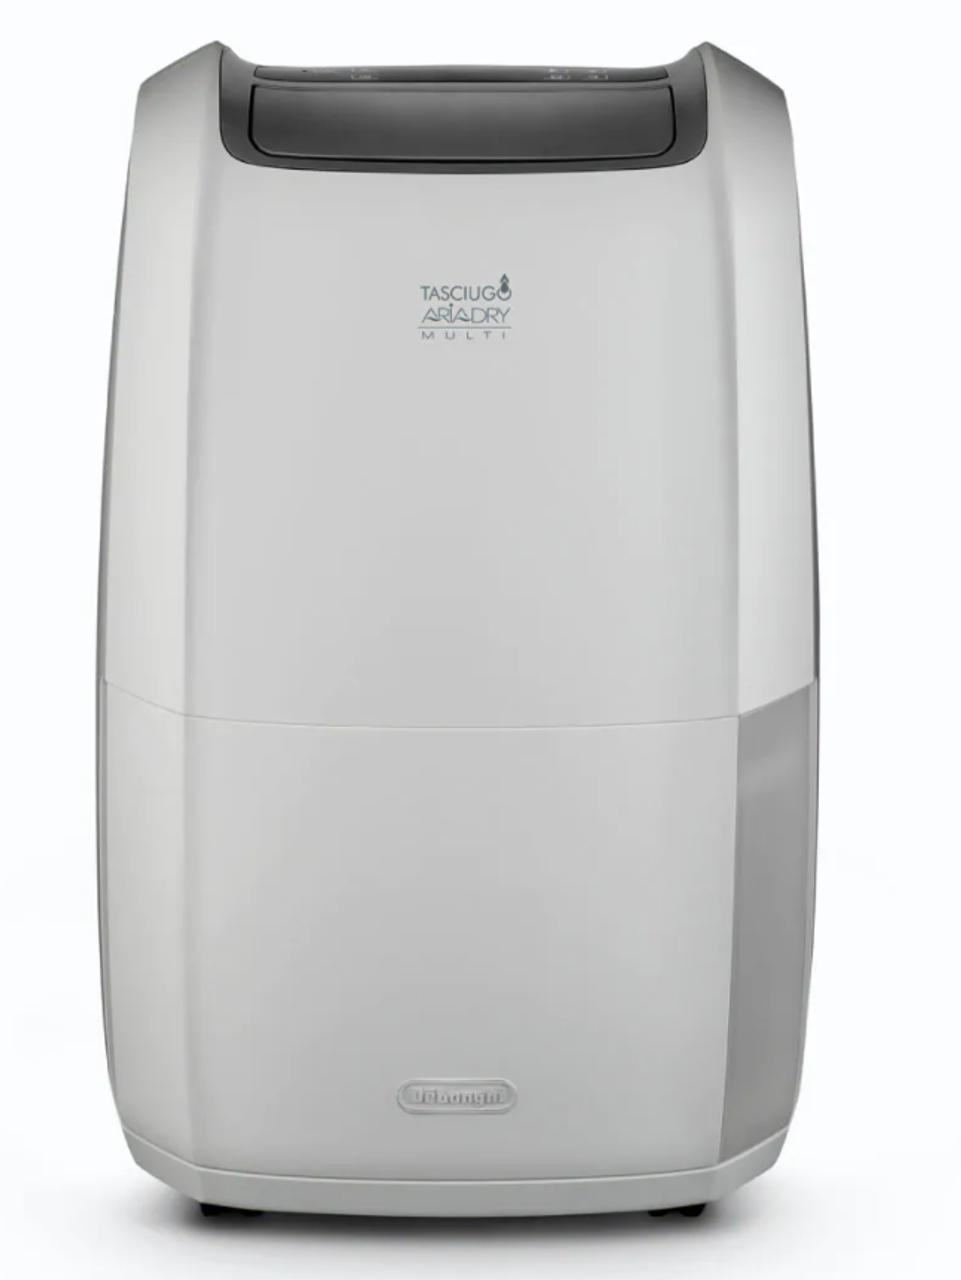 Delonghi DDSX25 Tasciugo AriaDry Multi Dehumidifier 20L - White